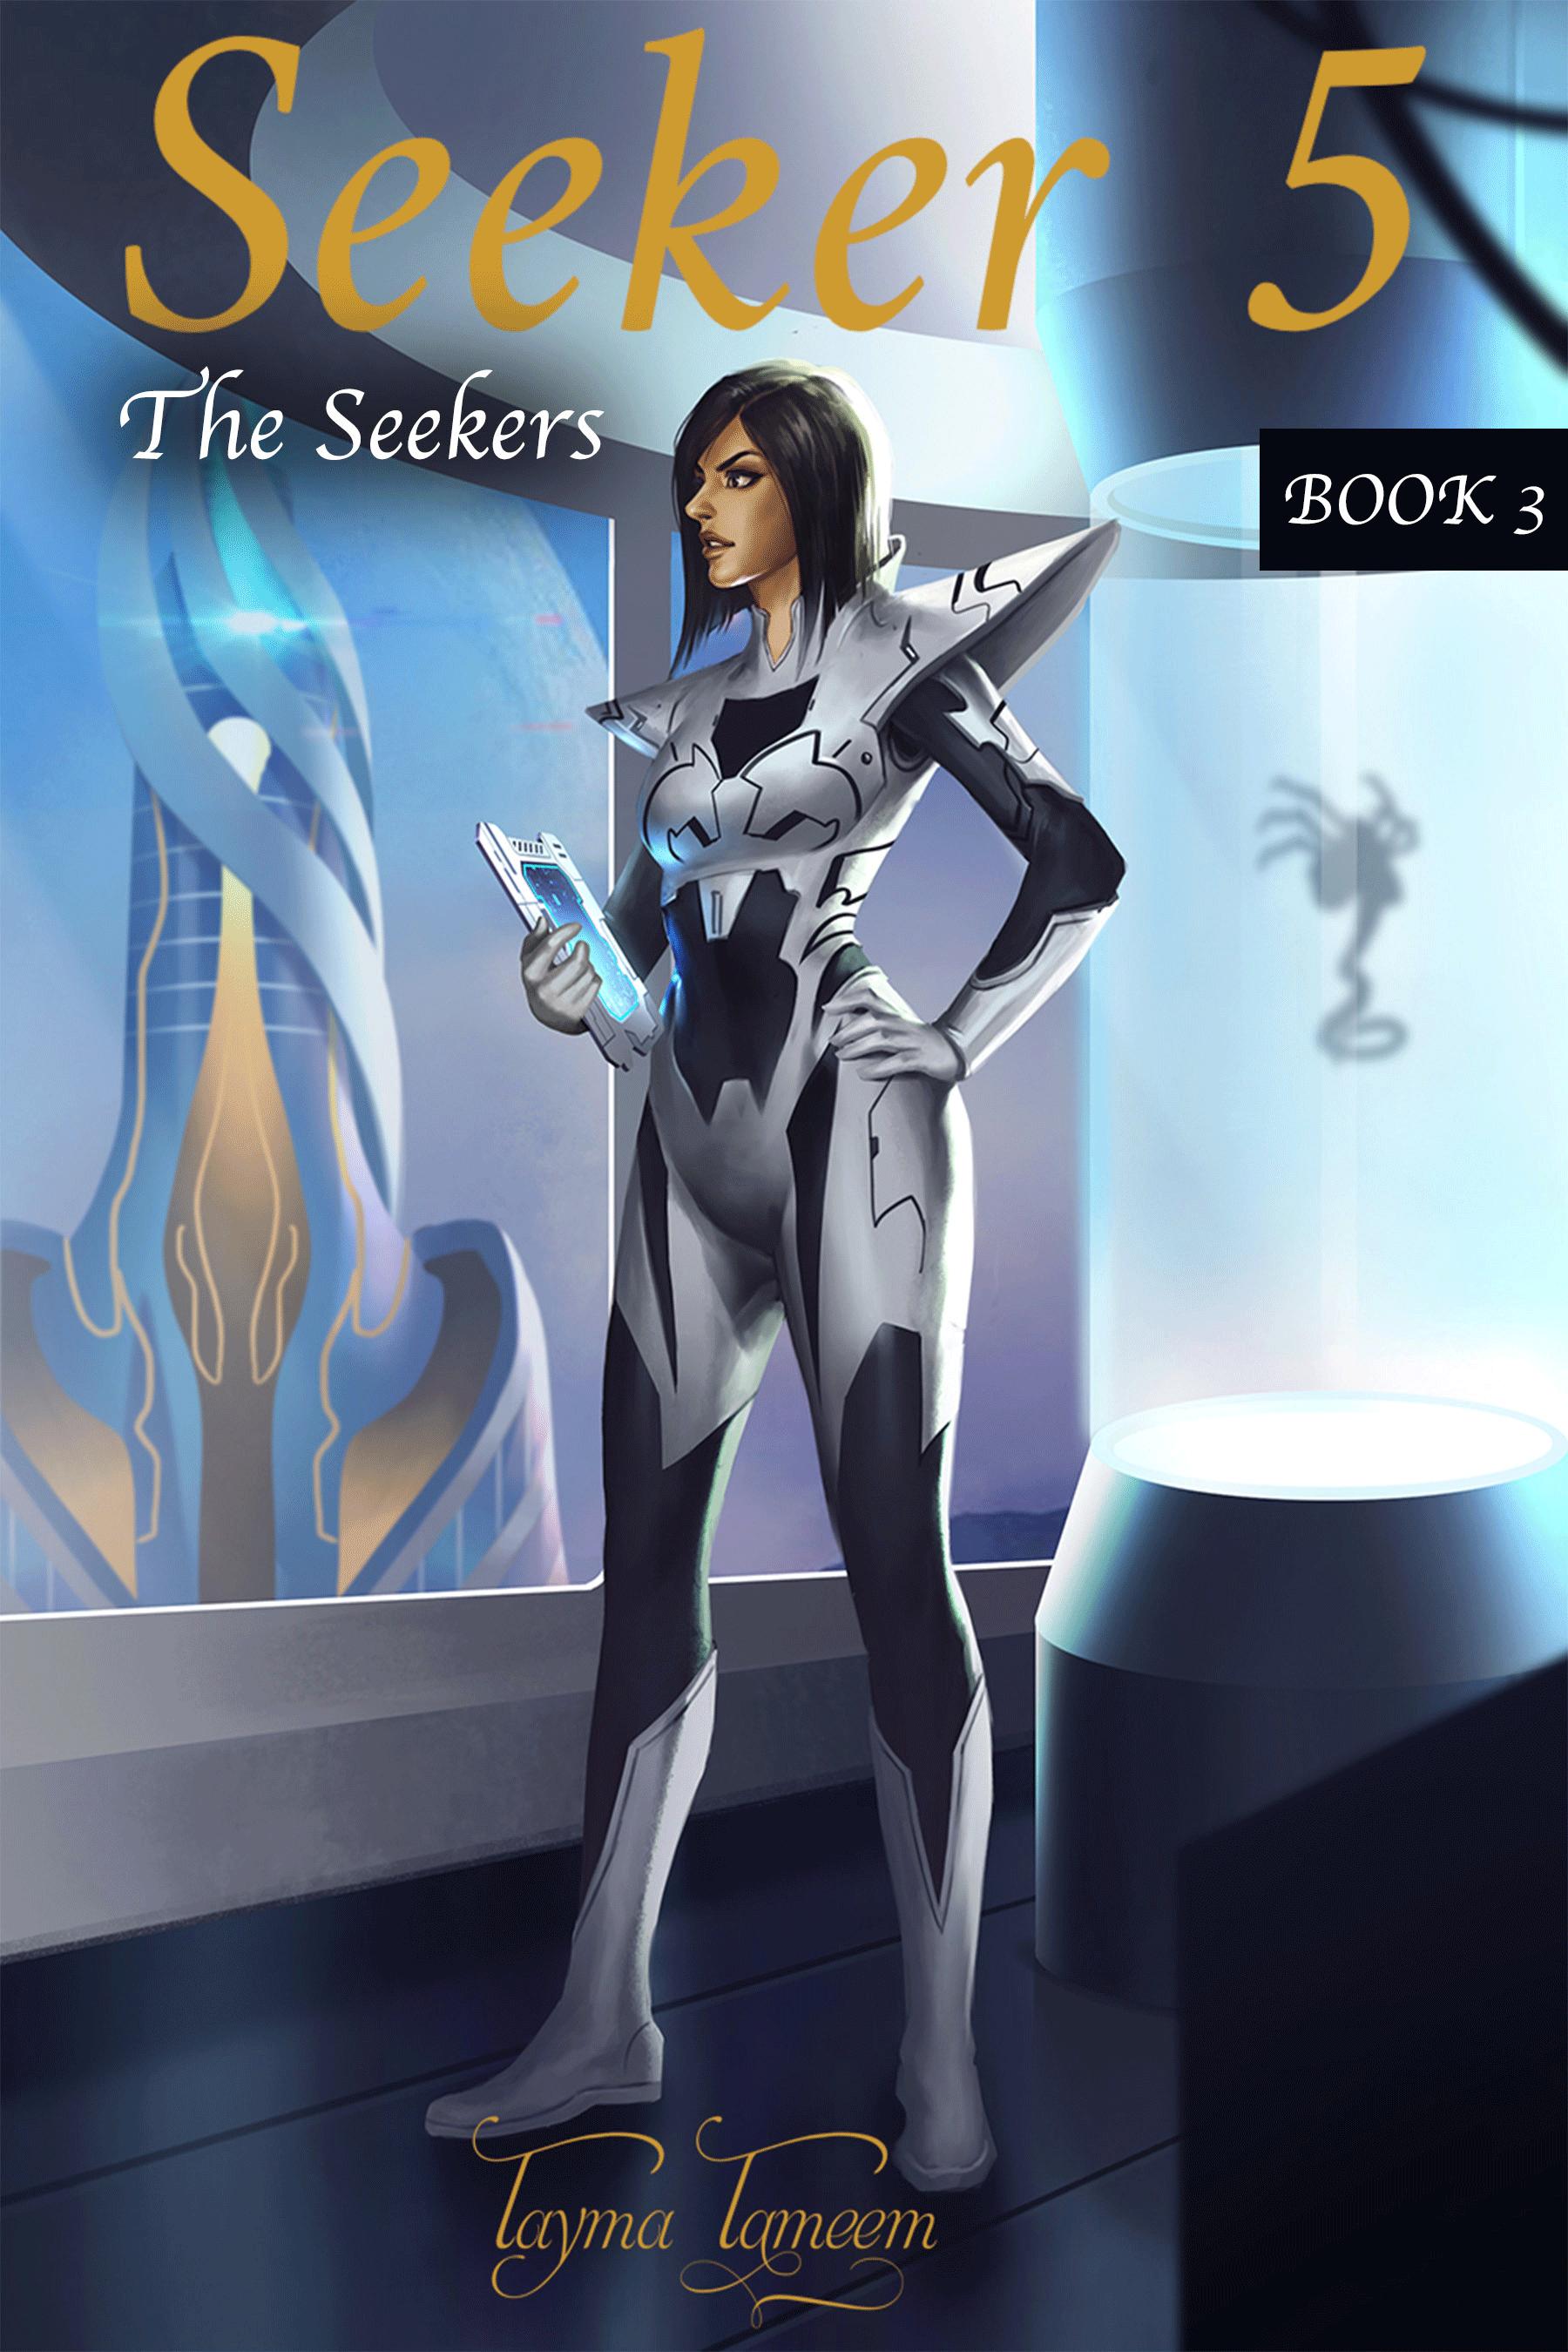 The Seeker 5, Book 3